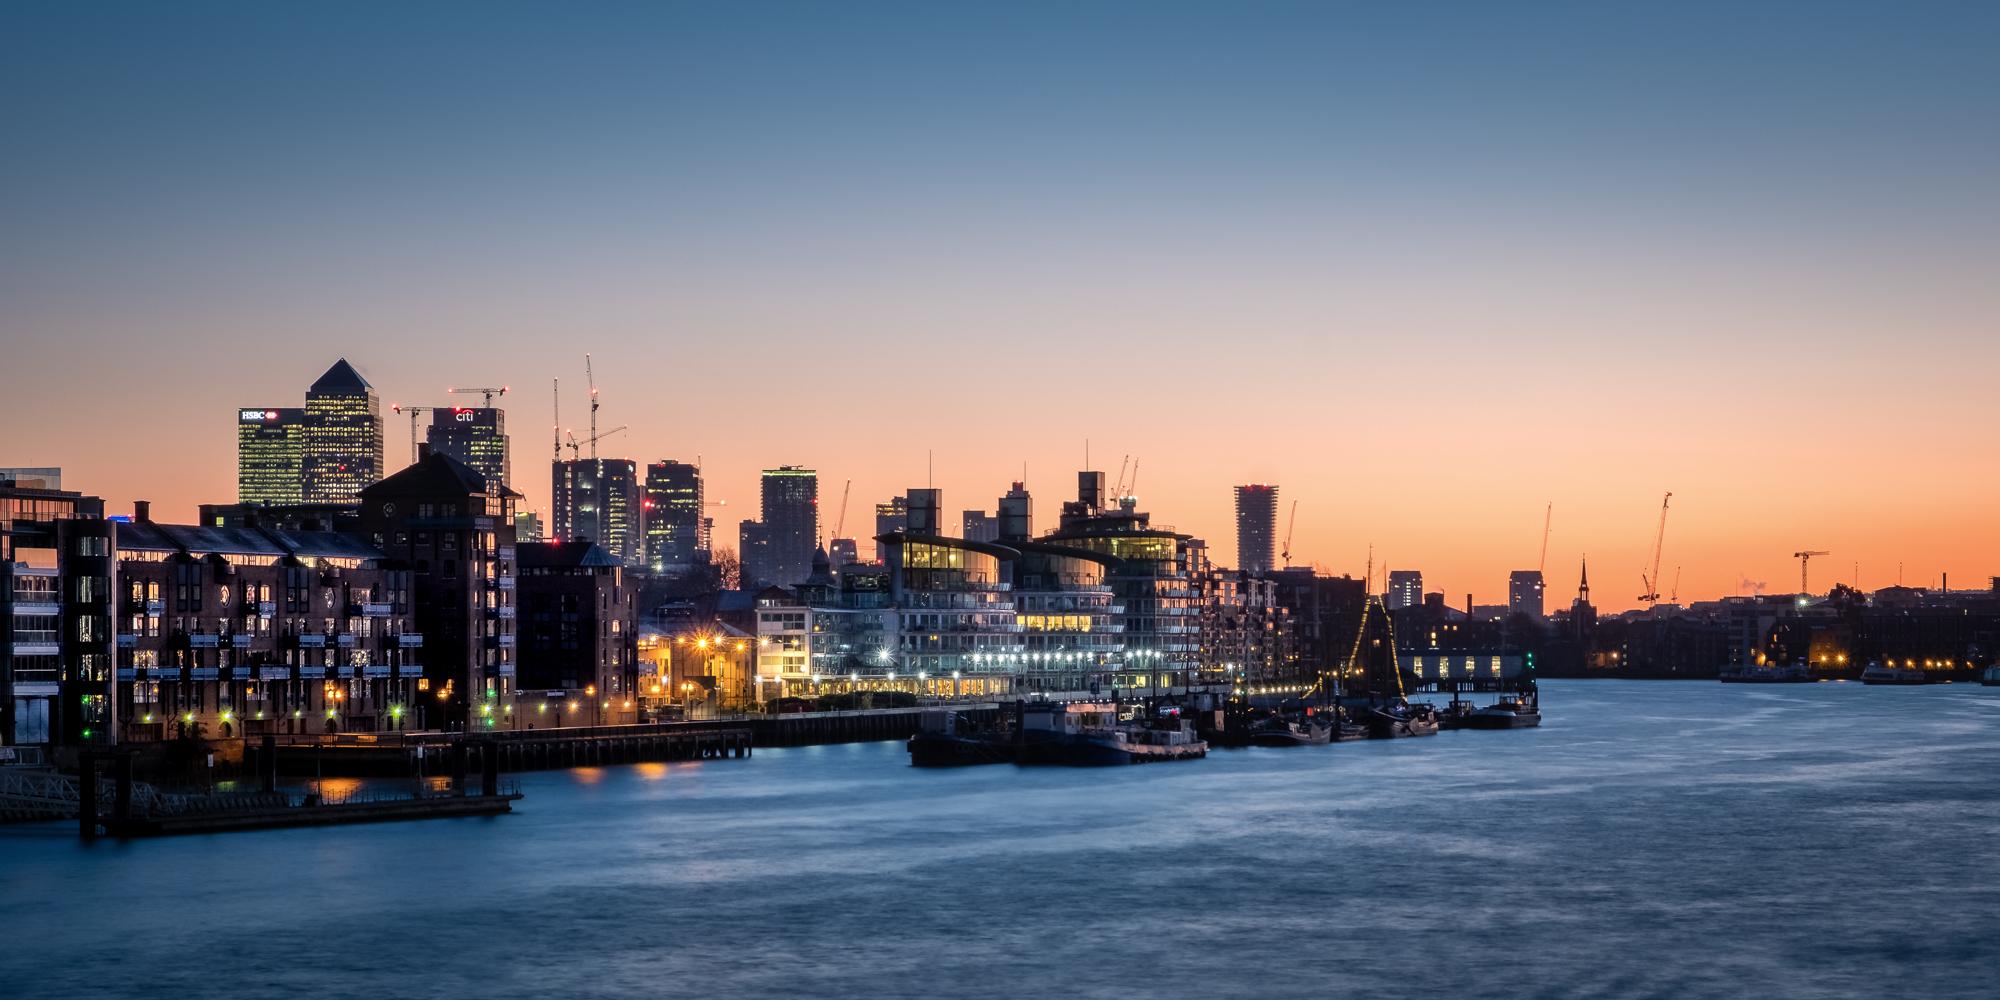 St Katherine's Dock during sunrise taken by Trevor Sherwin